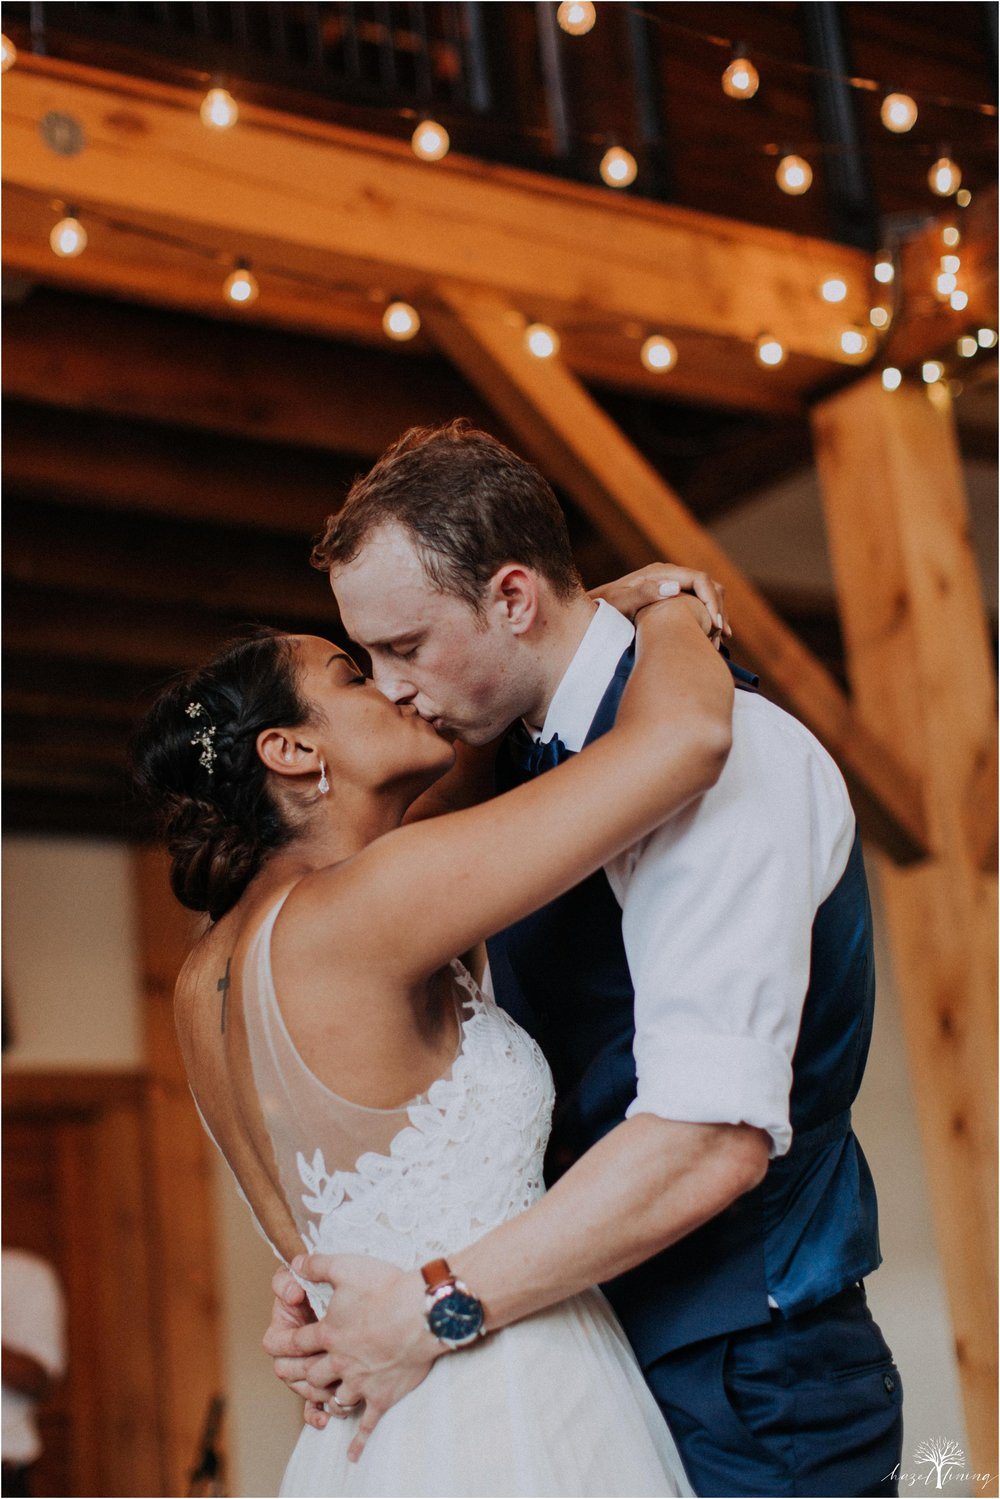 mariah-kreyling-samuel-sherratt-sherrattwiththeworld-peirce-farm-at-witch-hill-boston-massachusetts-wedding-photography-hazel-lining-travel-wedding-elopement-photography_0190.jpg